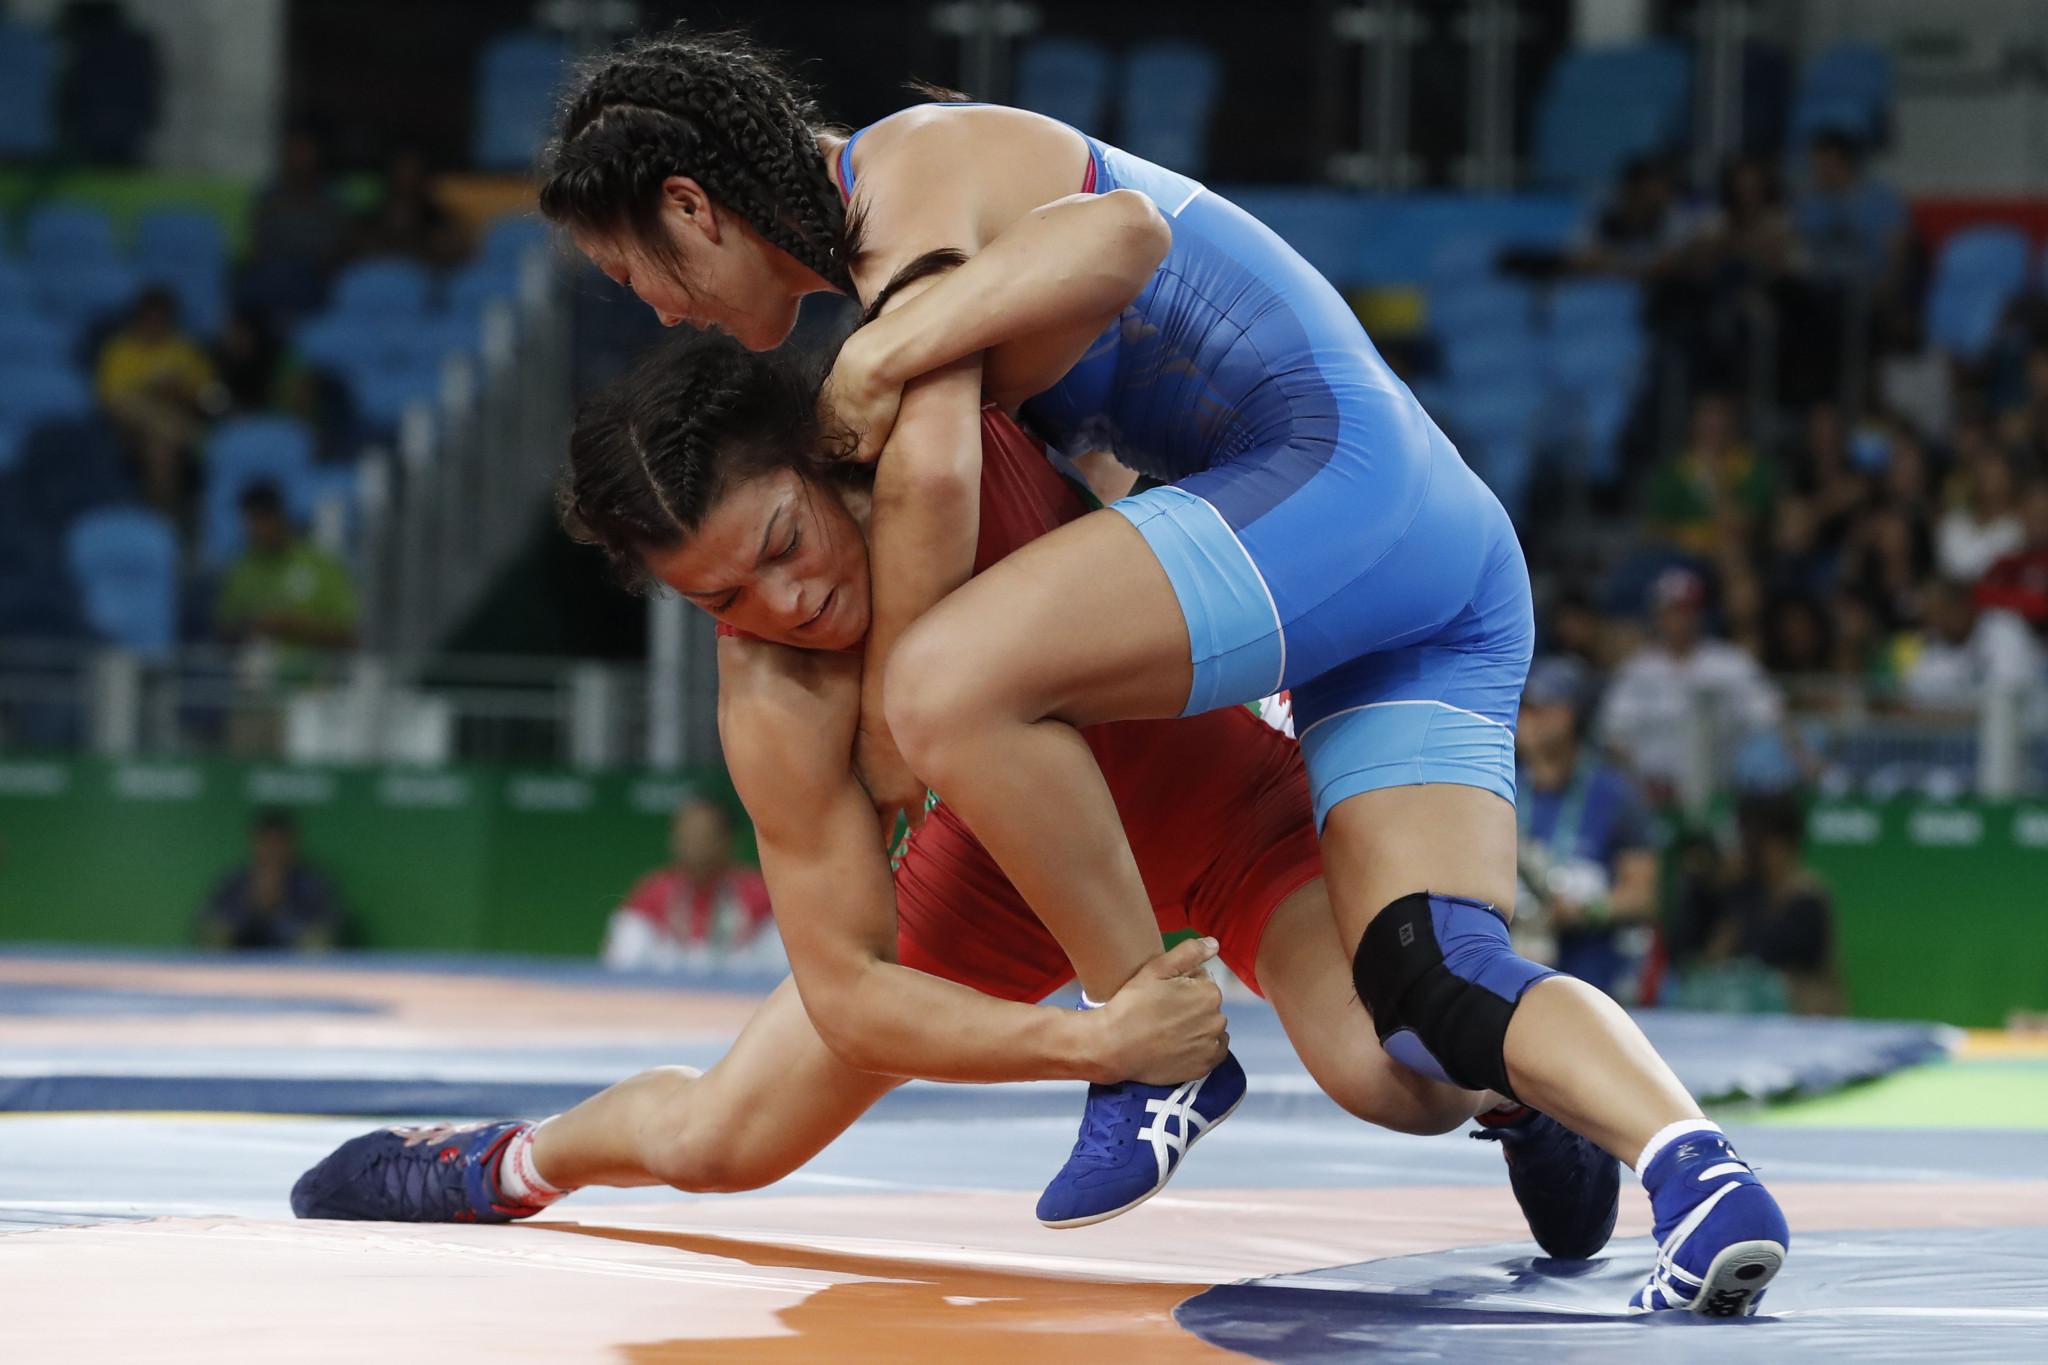 Hristova beats last year's gold medallist Manolova at European Wrestling Championships